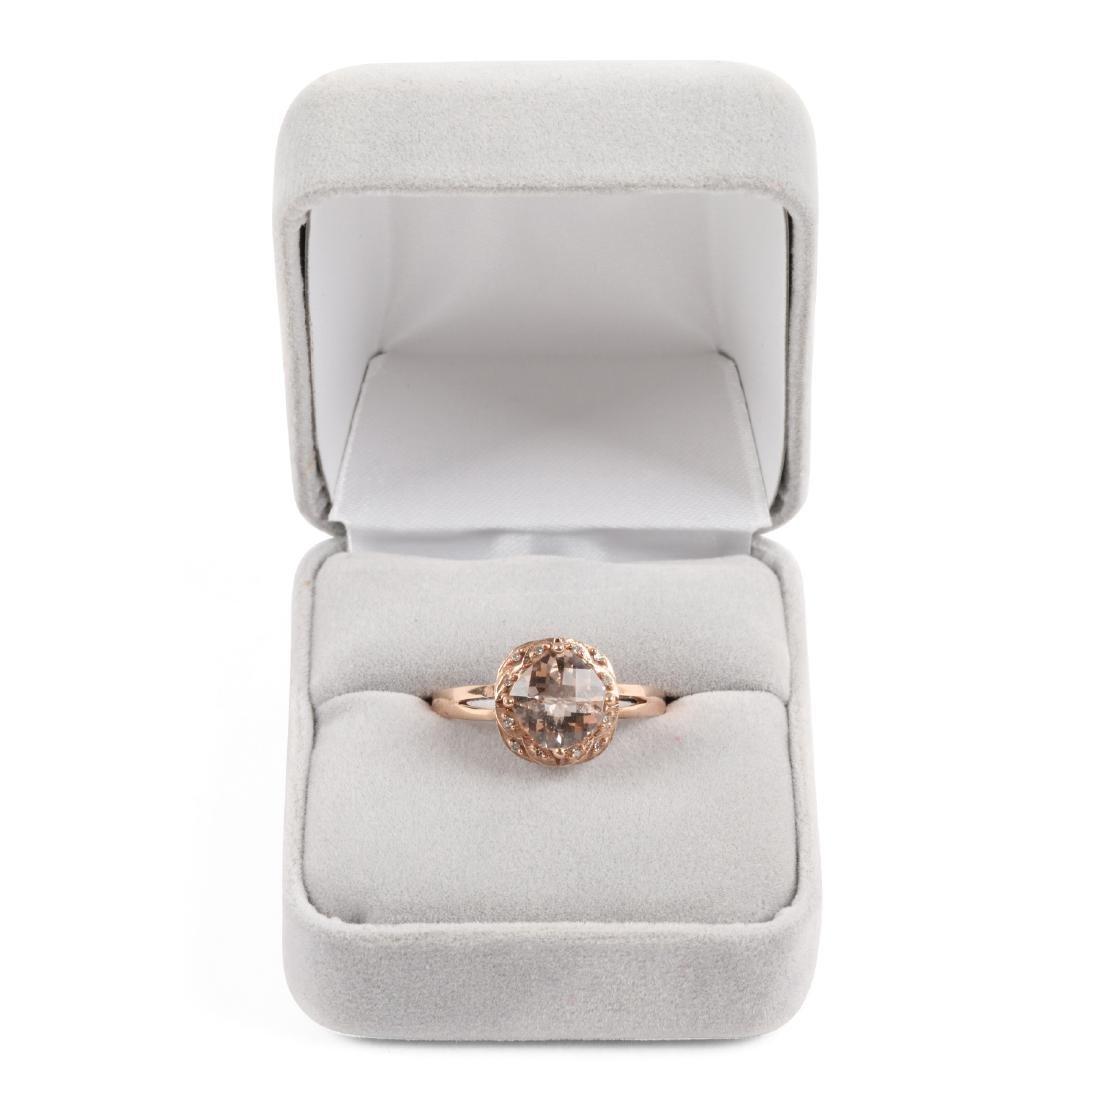 A 10K Rose Gold & Diamond Ring